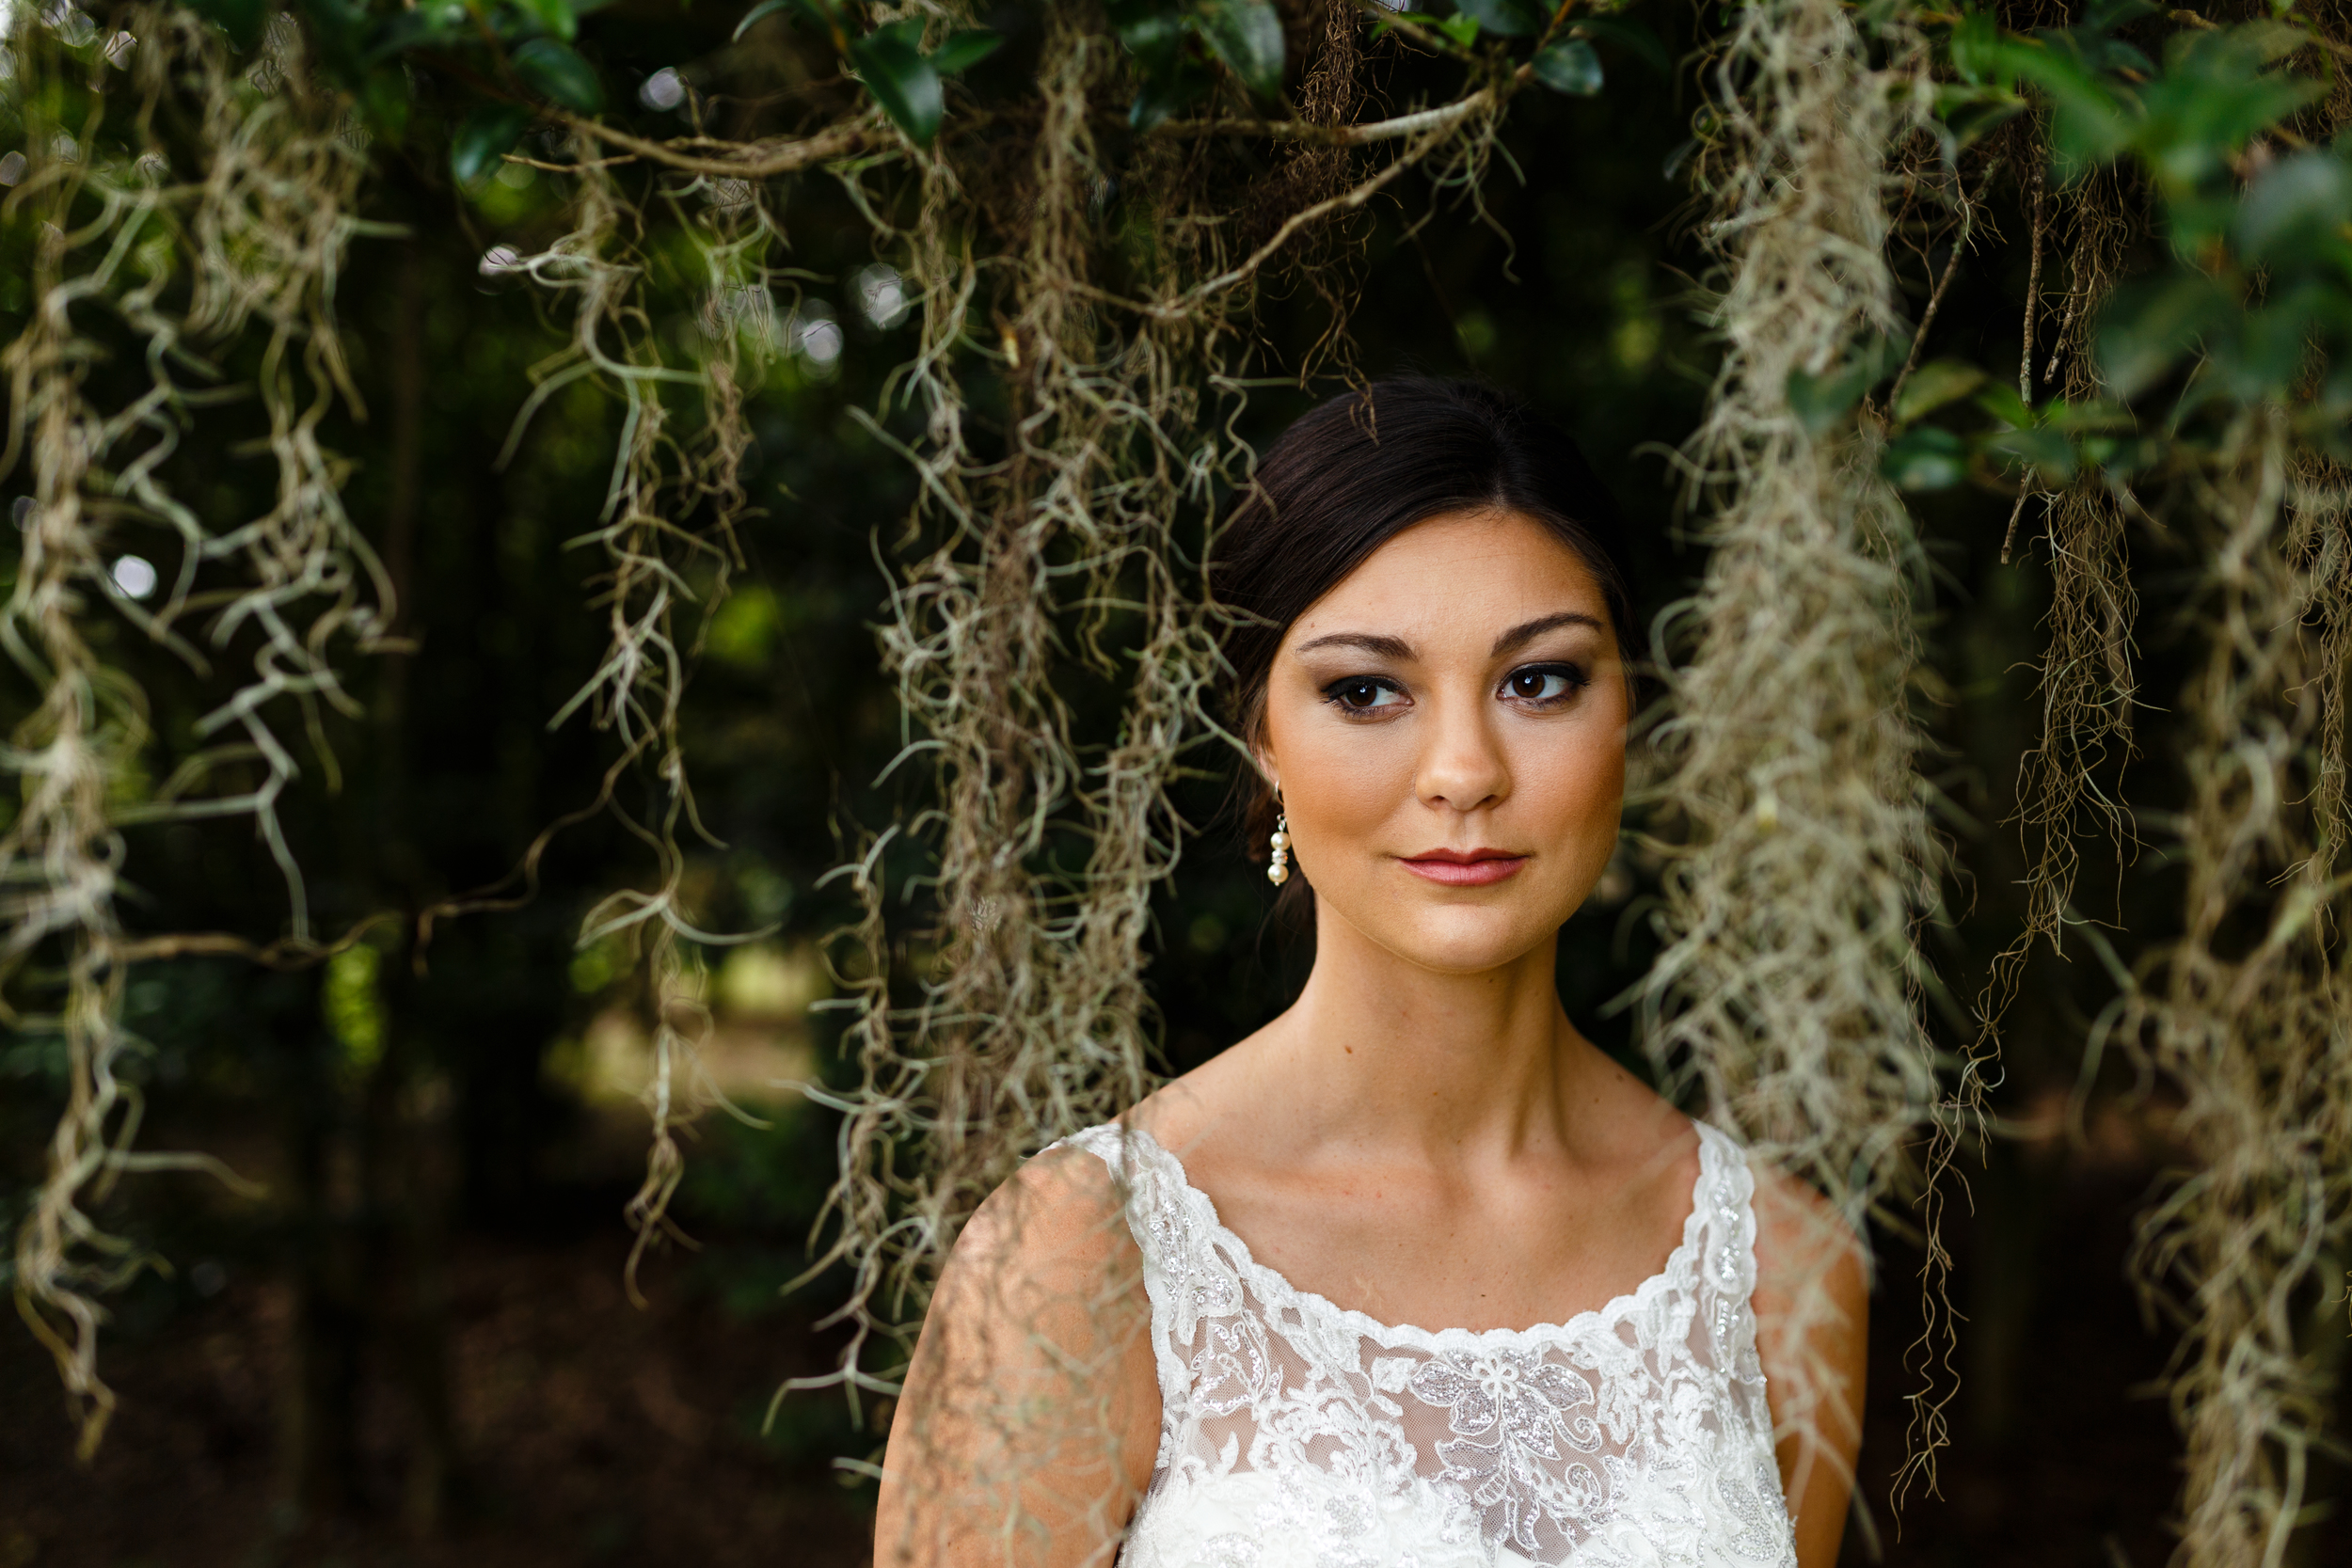 Bridal-wedding-portrait-lafayette-broussard-youngsville-photographer-6 (8).jpg